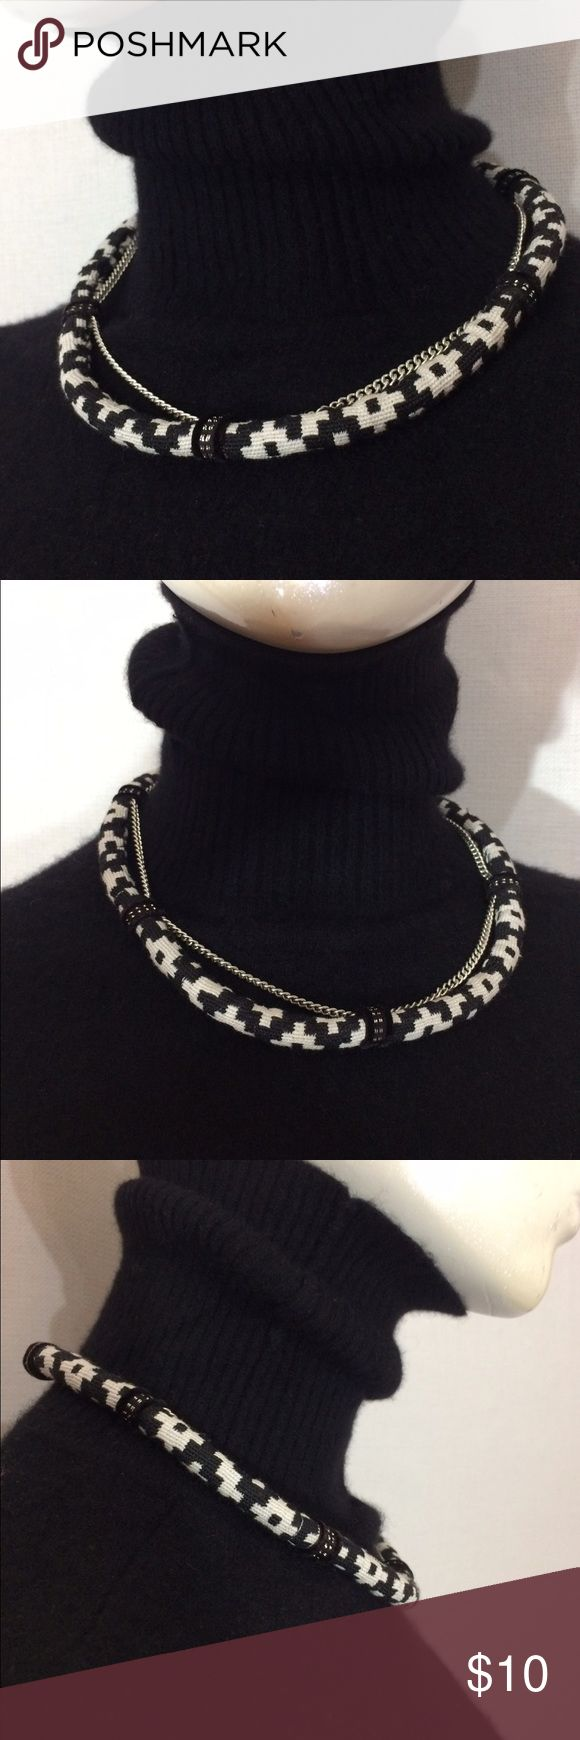 Southwestern Fabric black white Aztec Necklace OS One size Jewelry Necklaces